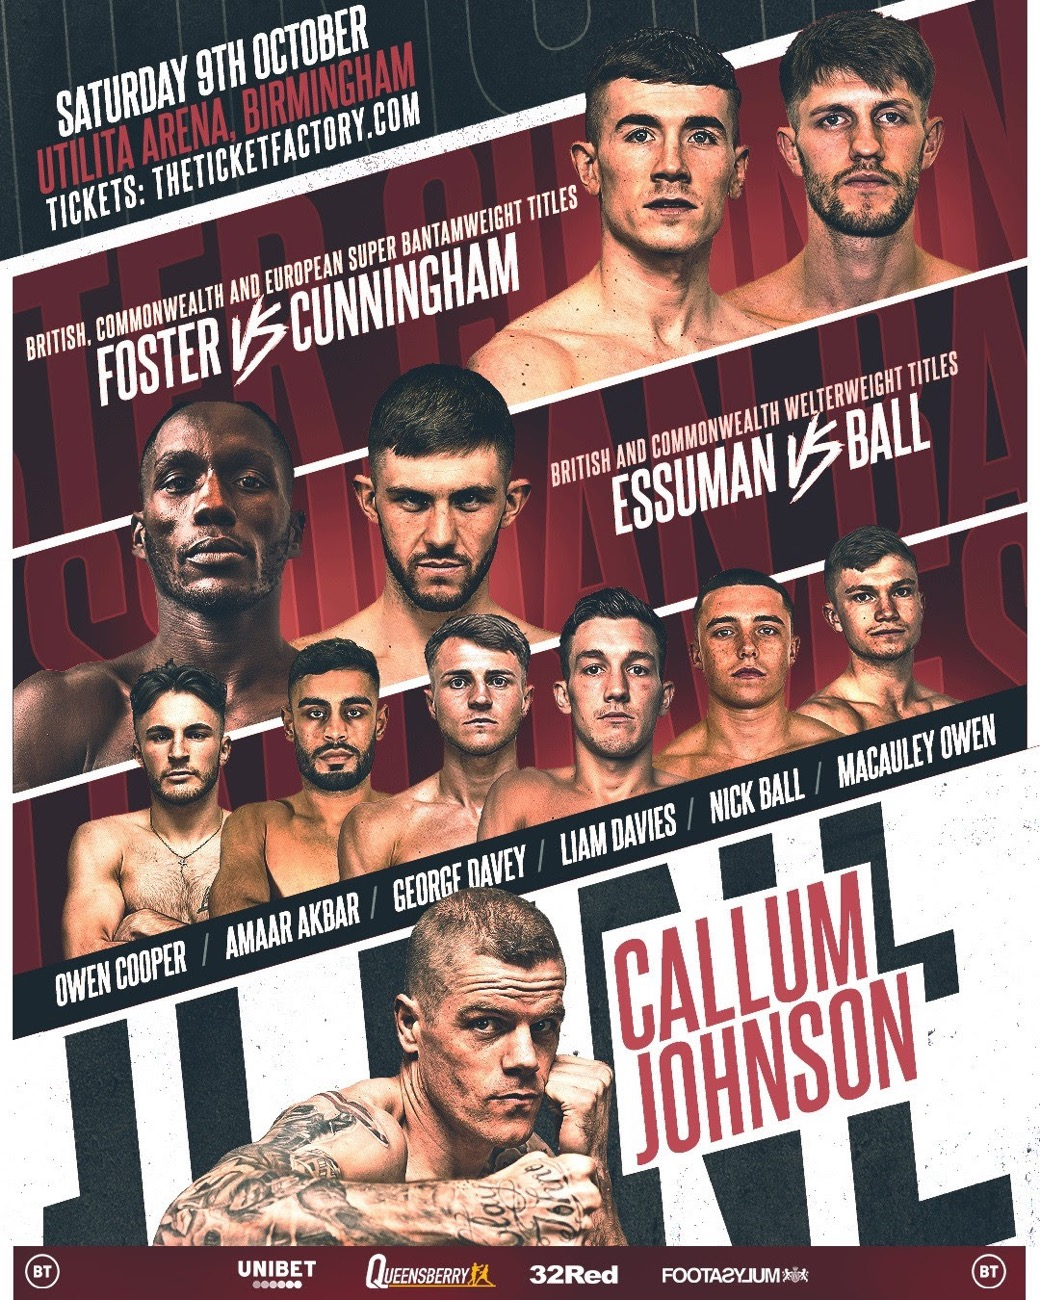 Foster vs Cunningham - BT Sport - October 9 - 2 pm ET